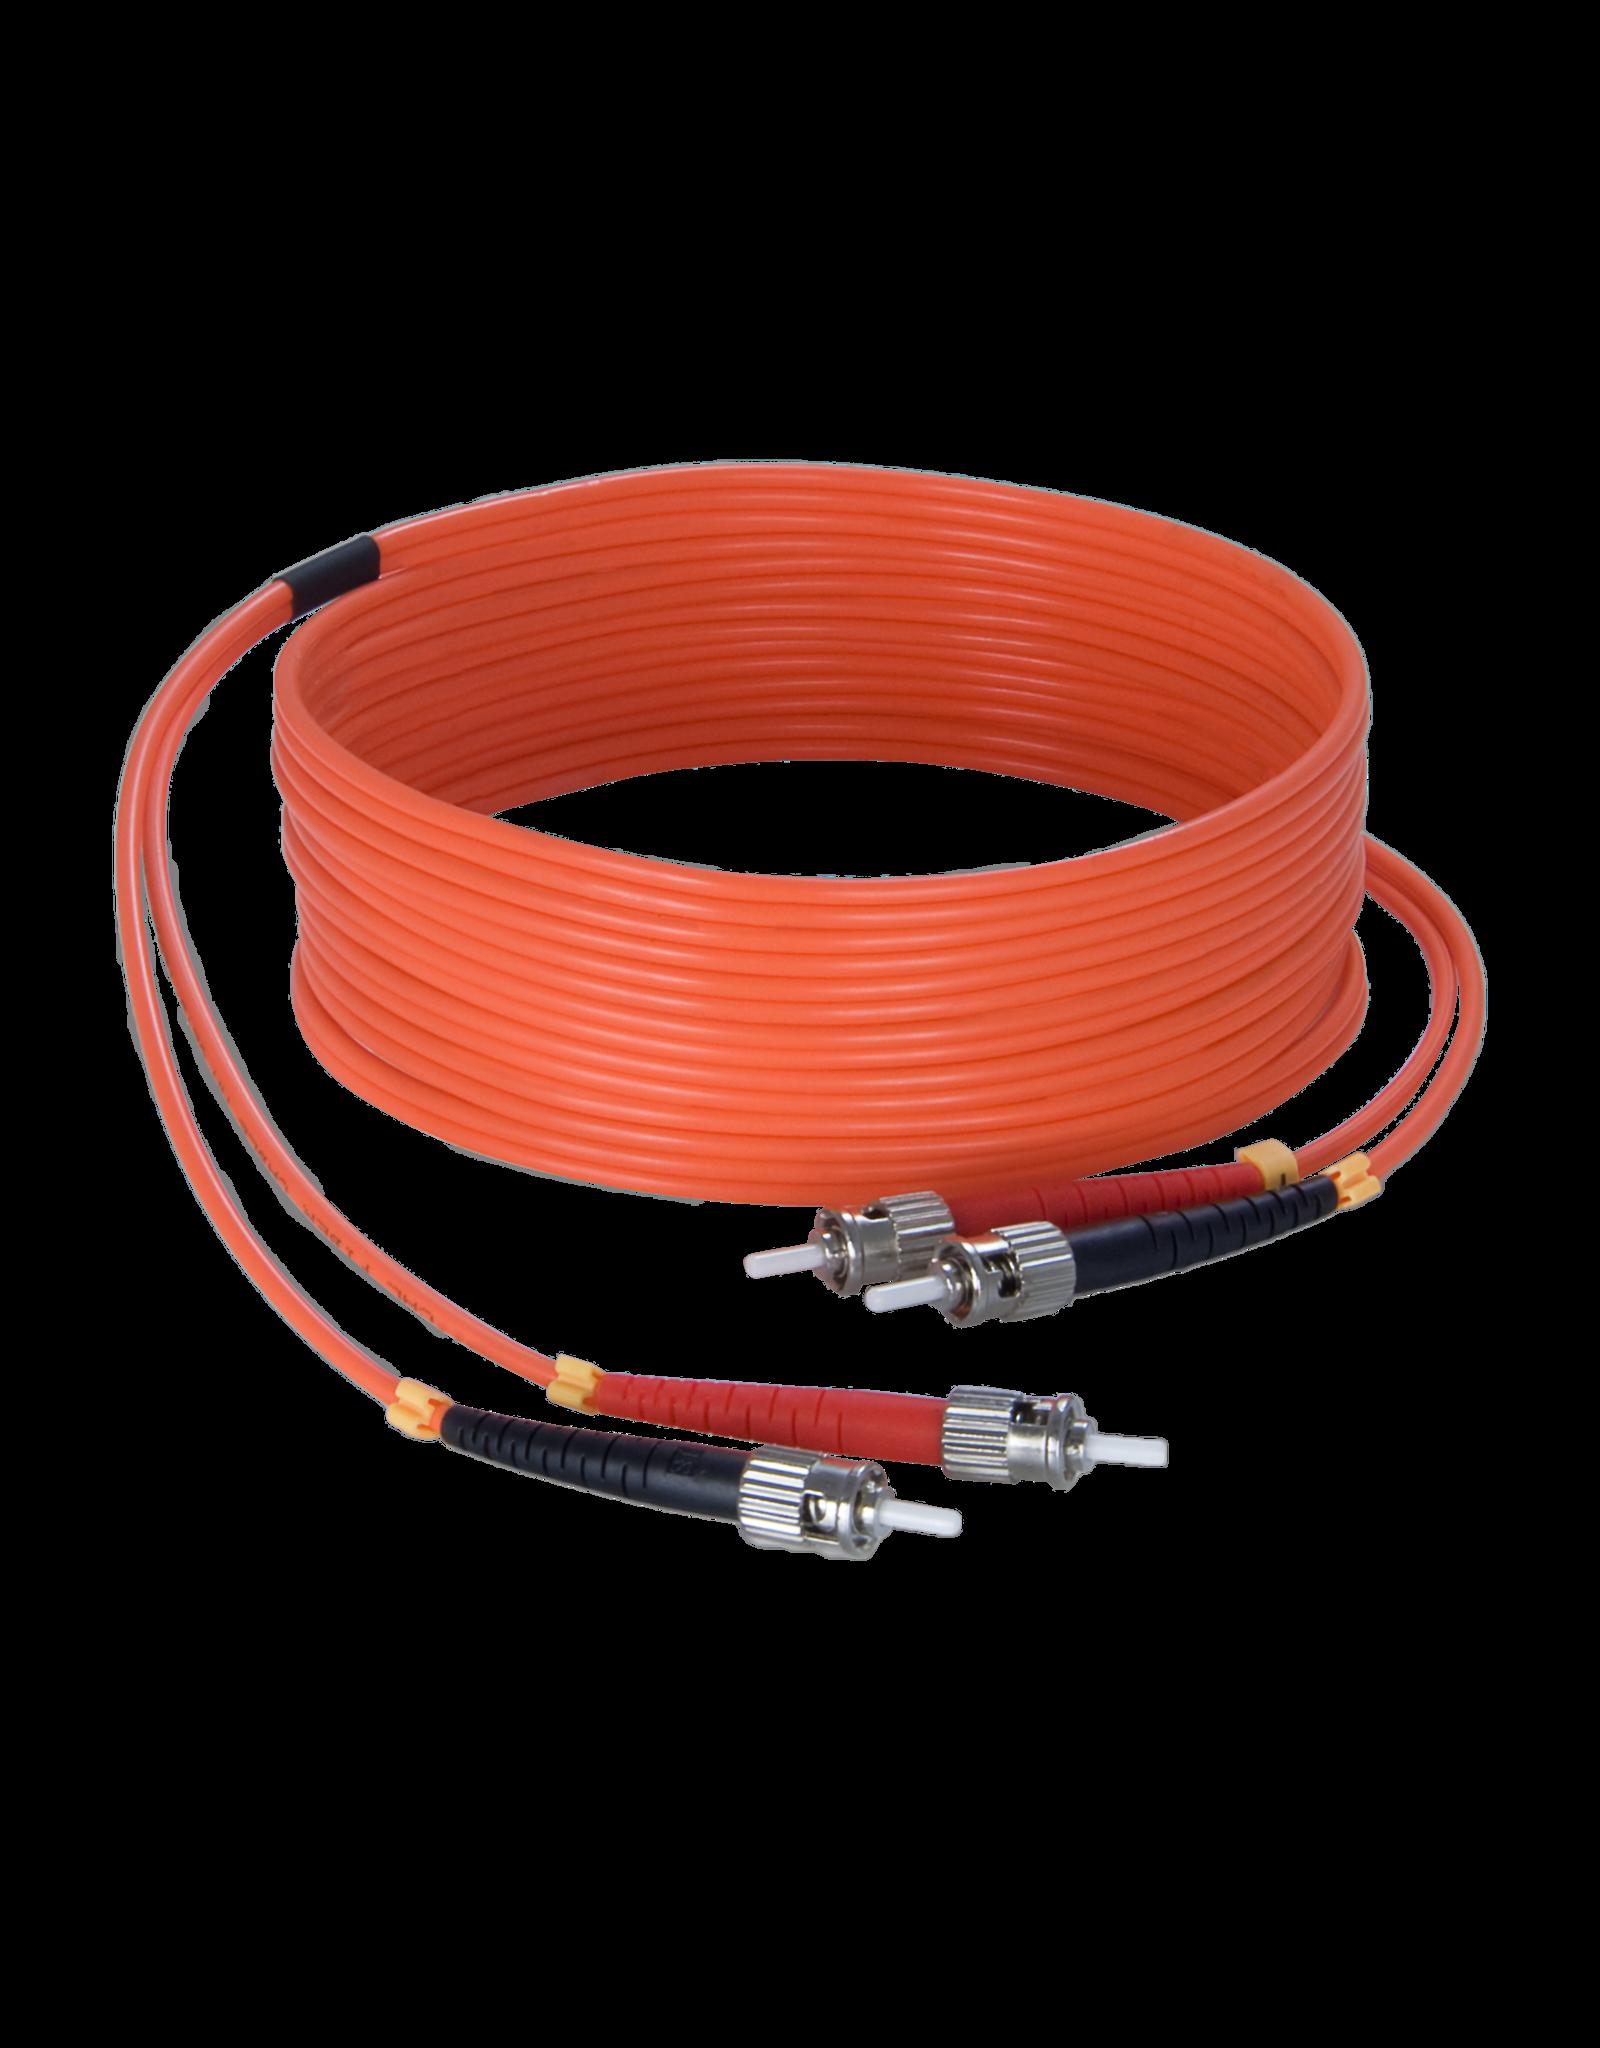 Audac Fiber optic cable - st/pc - st/pc - LSHF 90 meter